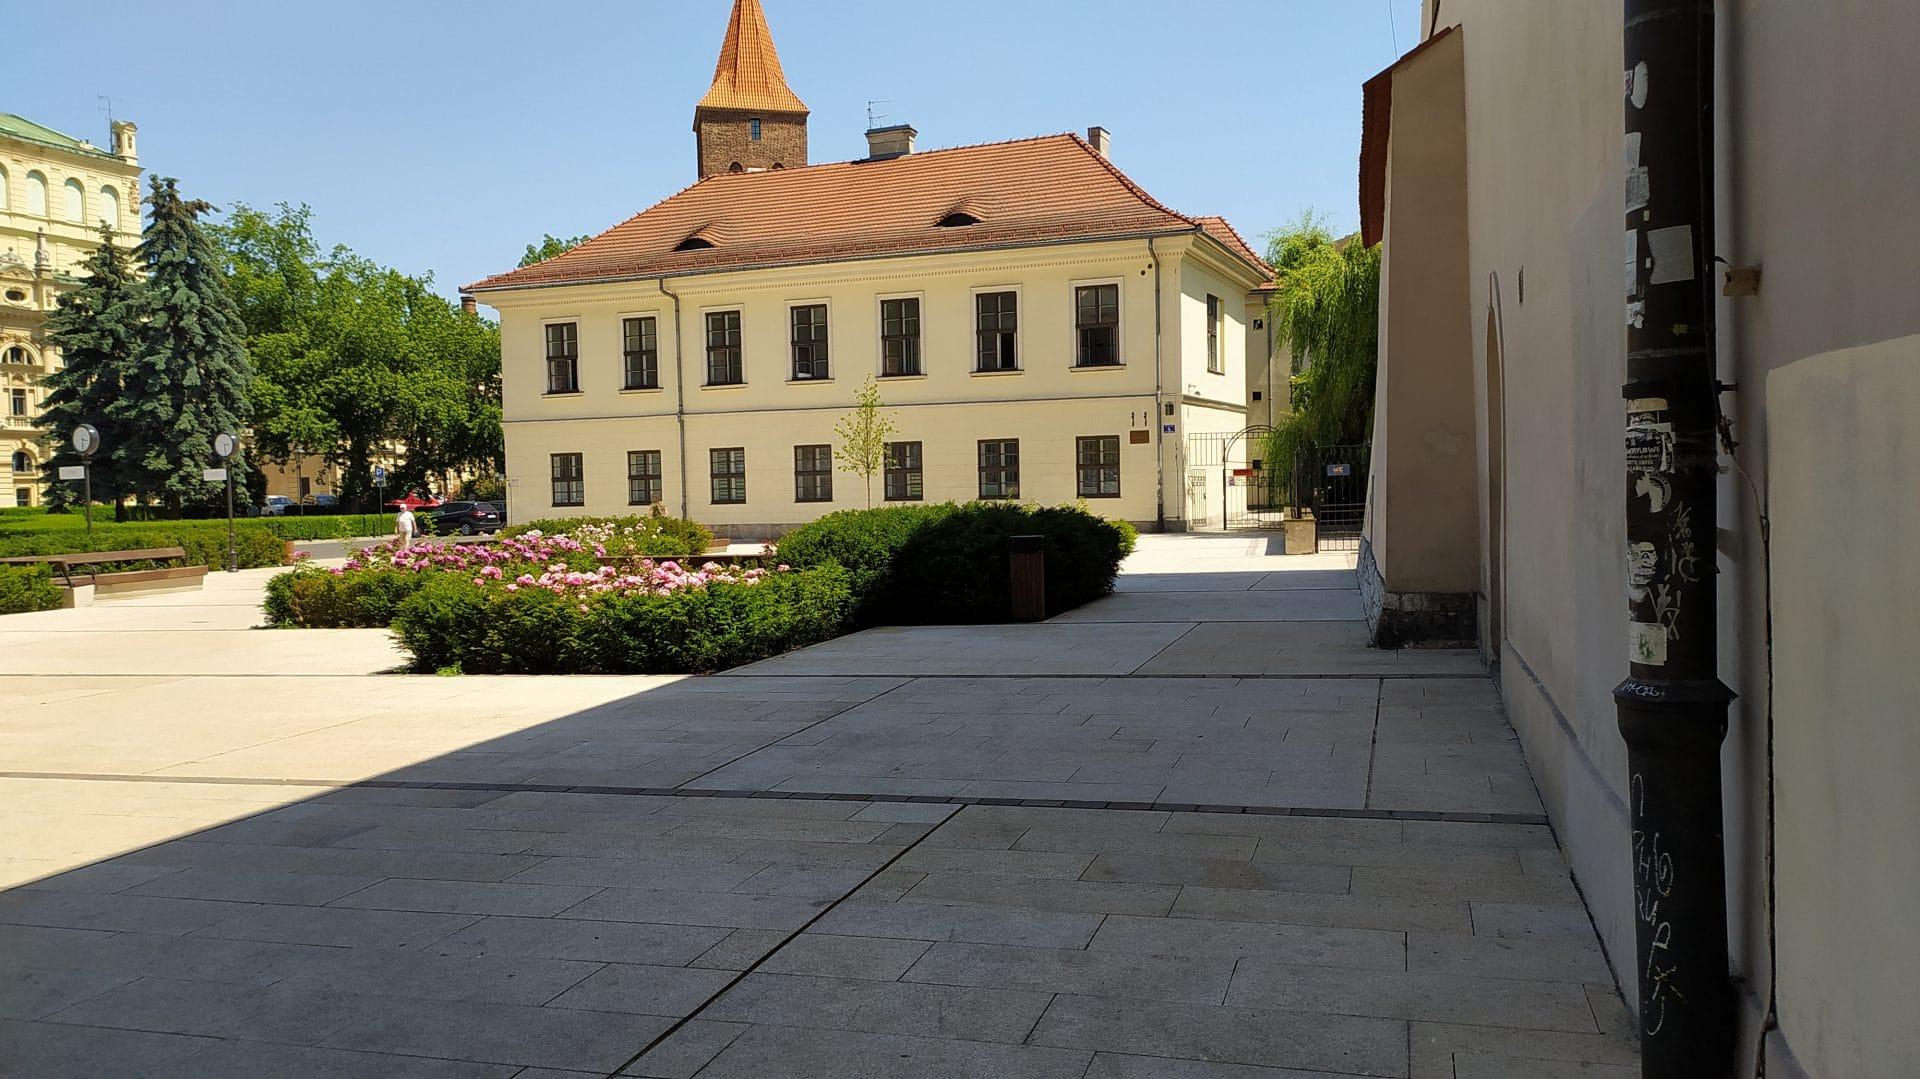 Plac św. Ducha Cień.